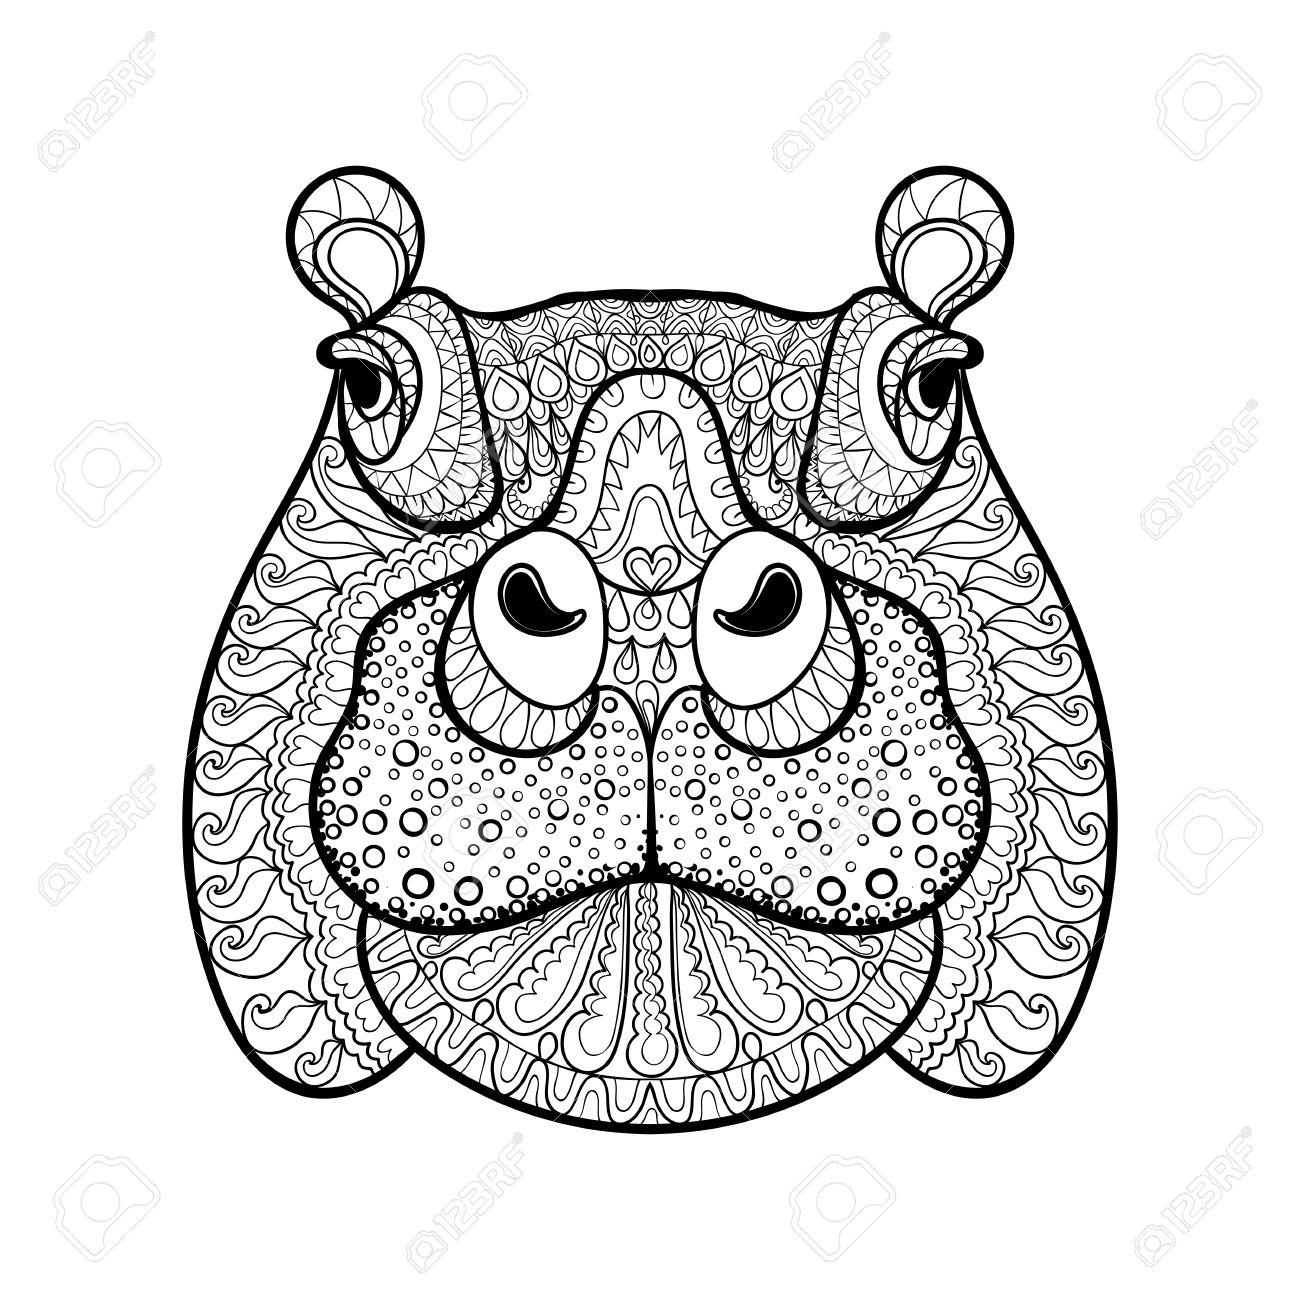 hand drawn tribal hippopotamus head animal totem for adult coloring rh 123rf com Crayon Vector Football Outline Vector